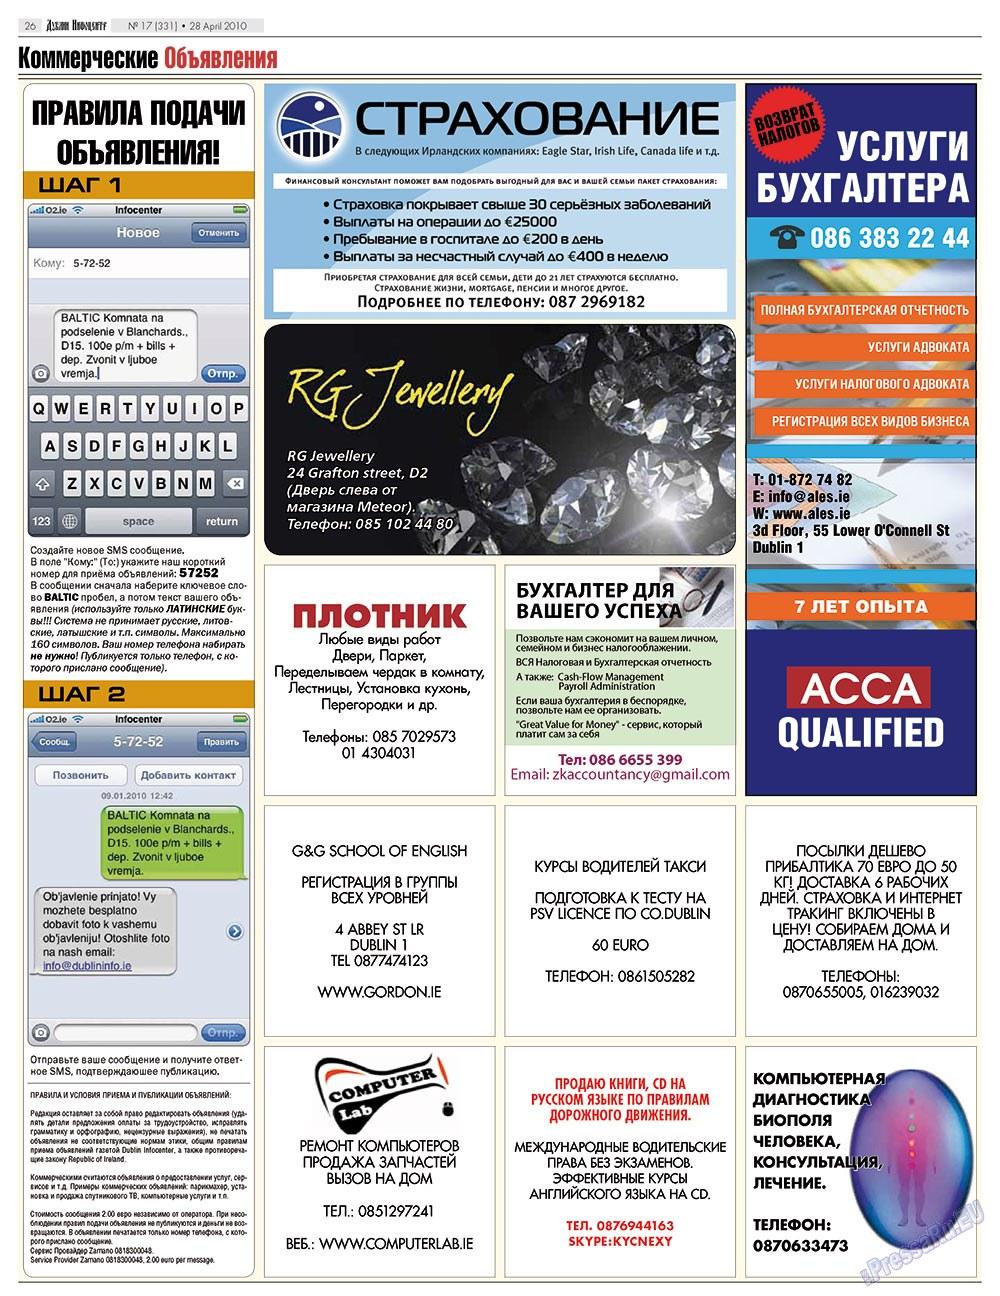 Дублин инфоцентр (газета). 2010 год, номер 17, стр. 26